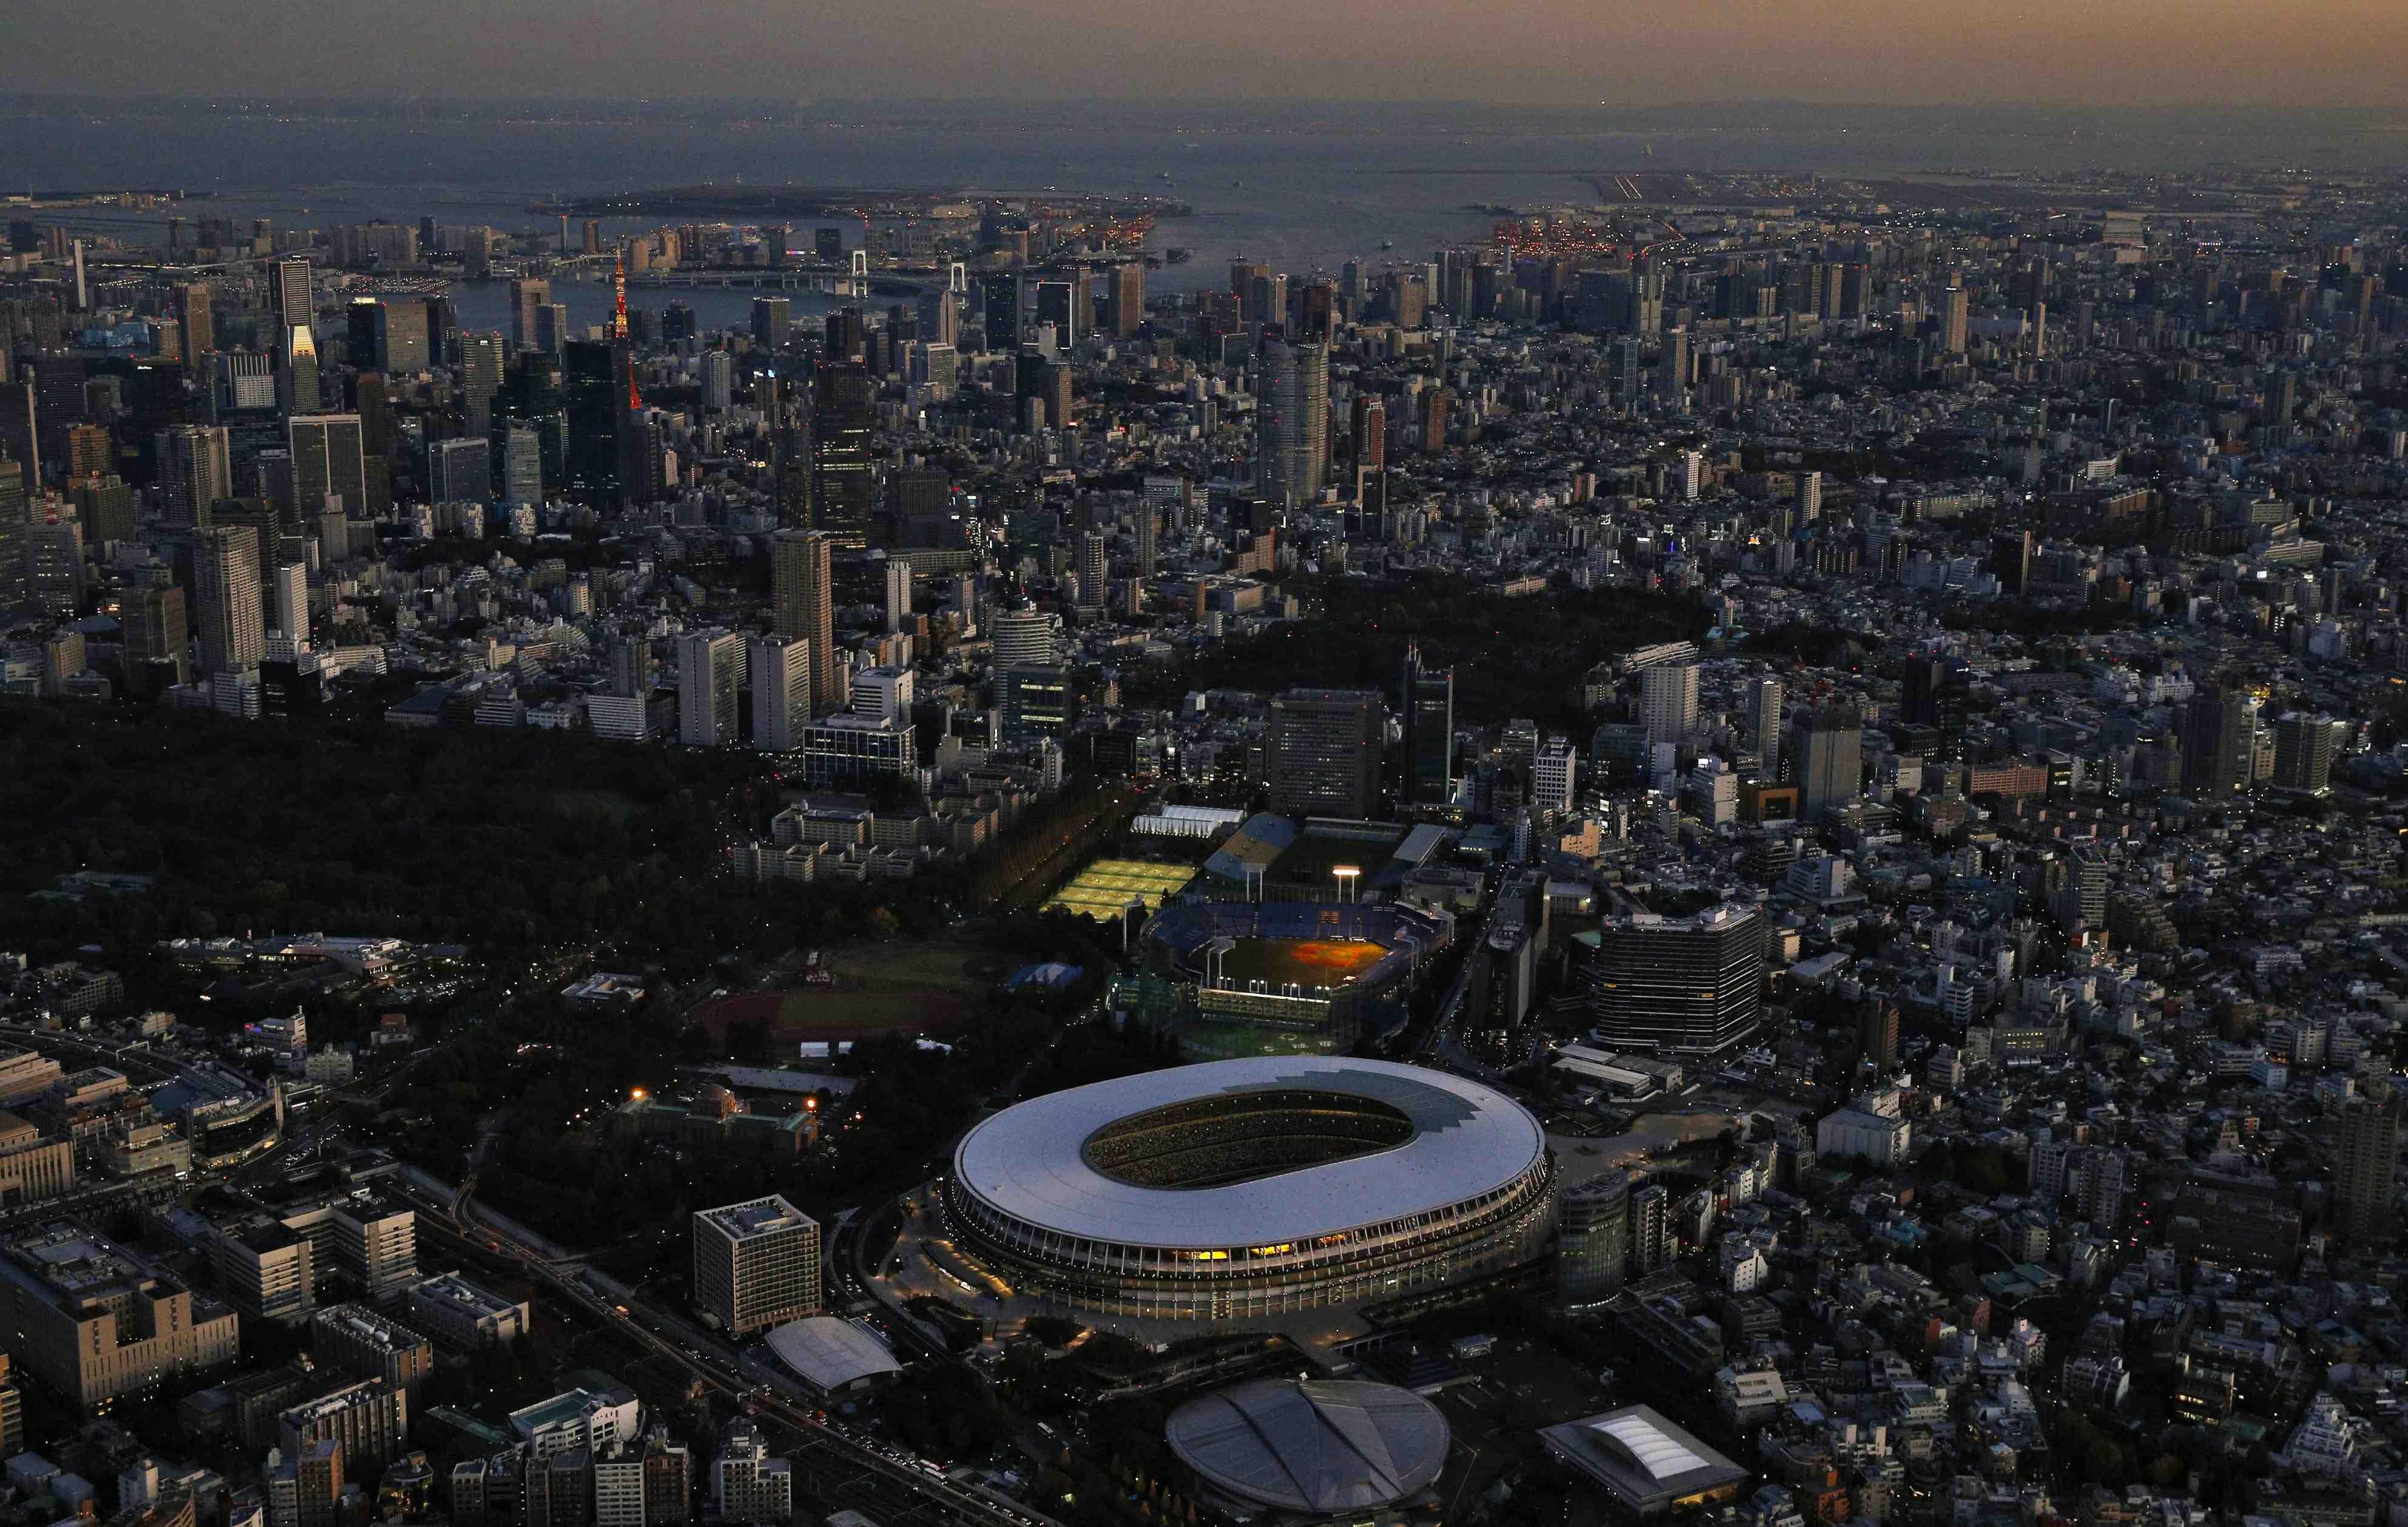 Japan New National Stadium Tokyo Olympics 2020 006